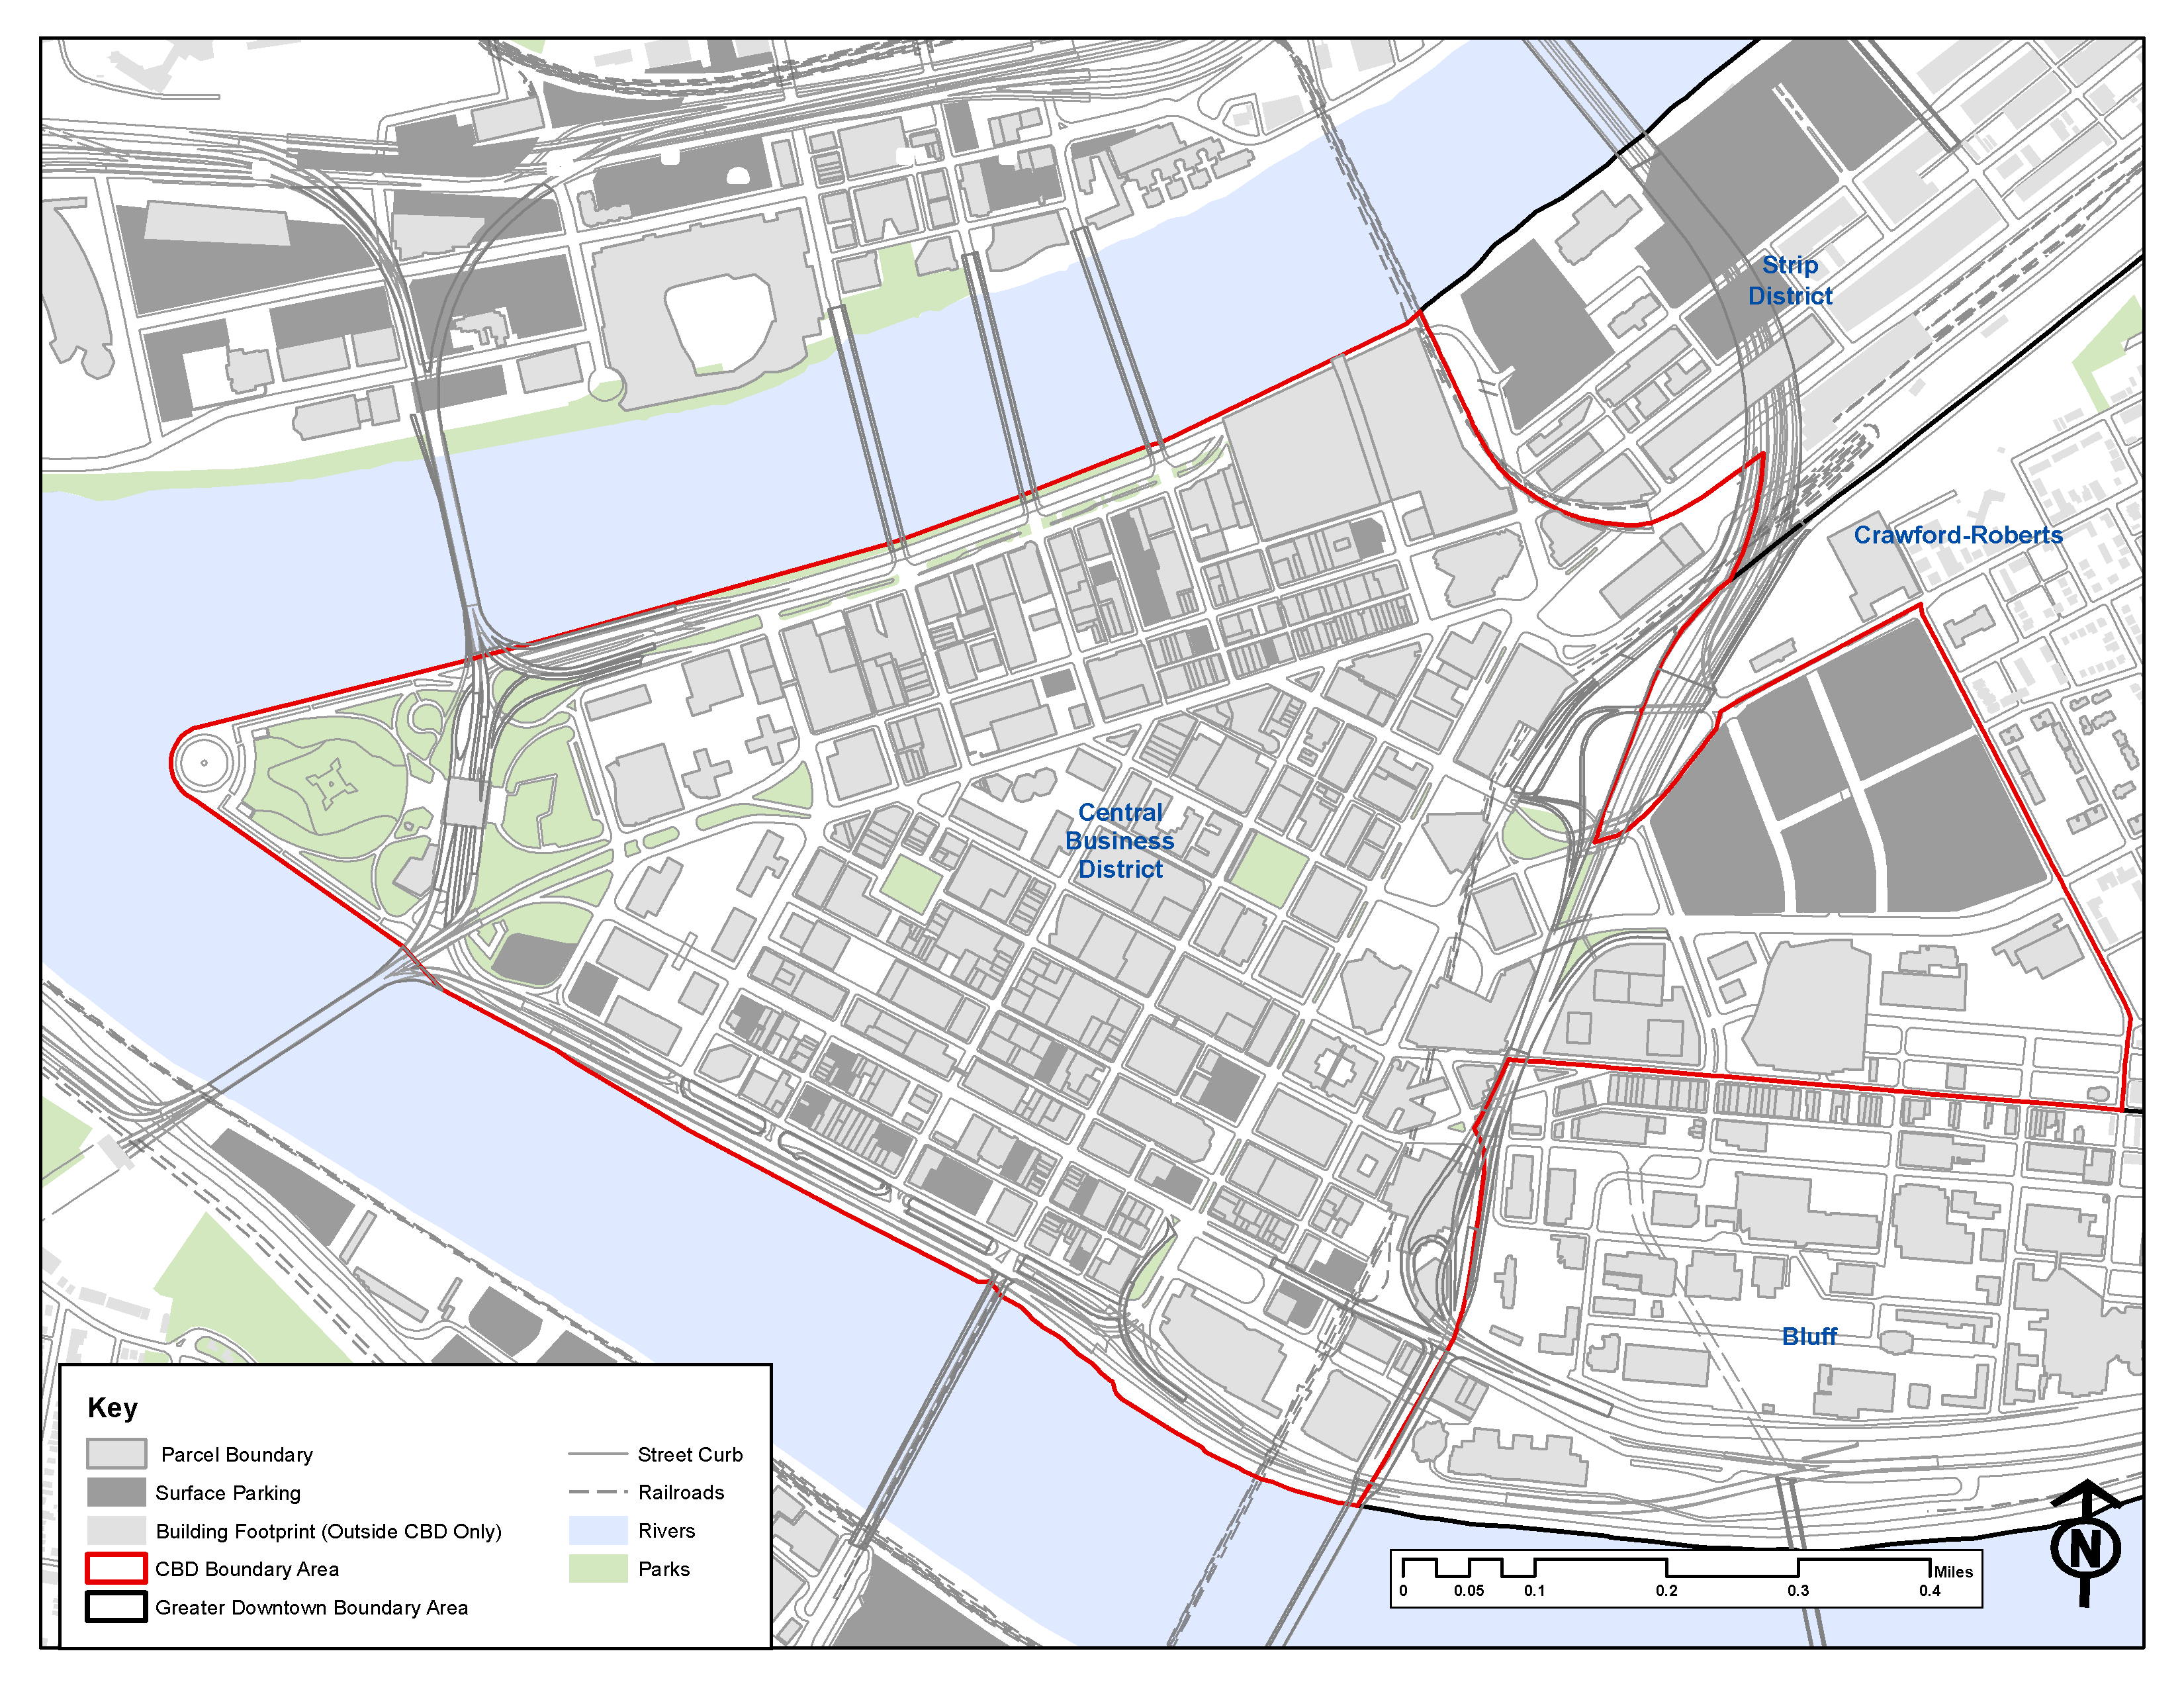 Downtown Mobility Plan Study Area